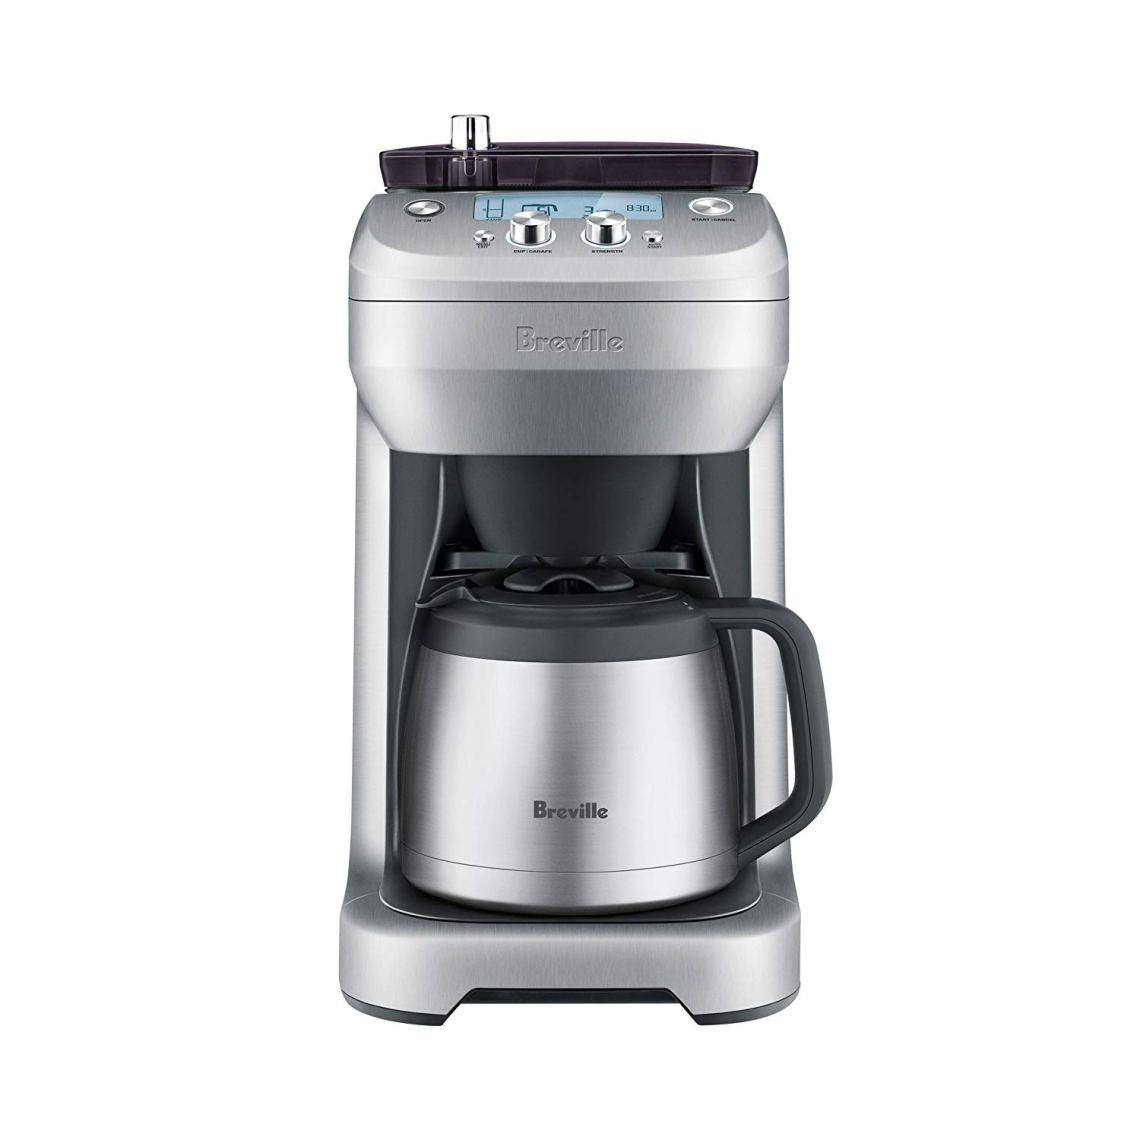 Coffee-Maker-With-Grinder-Breville-Grind-Control